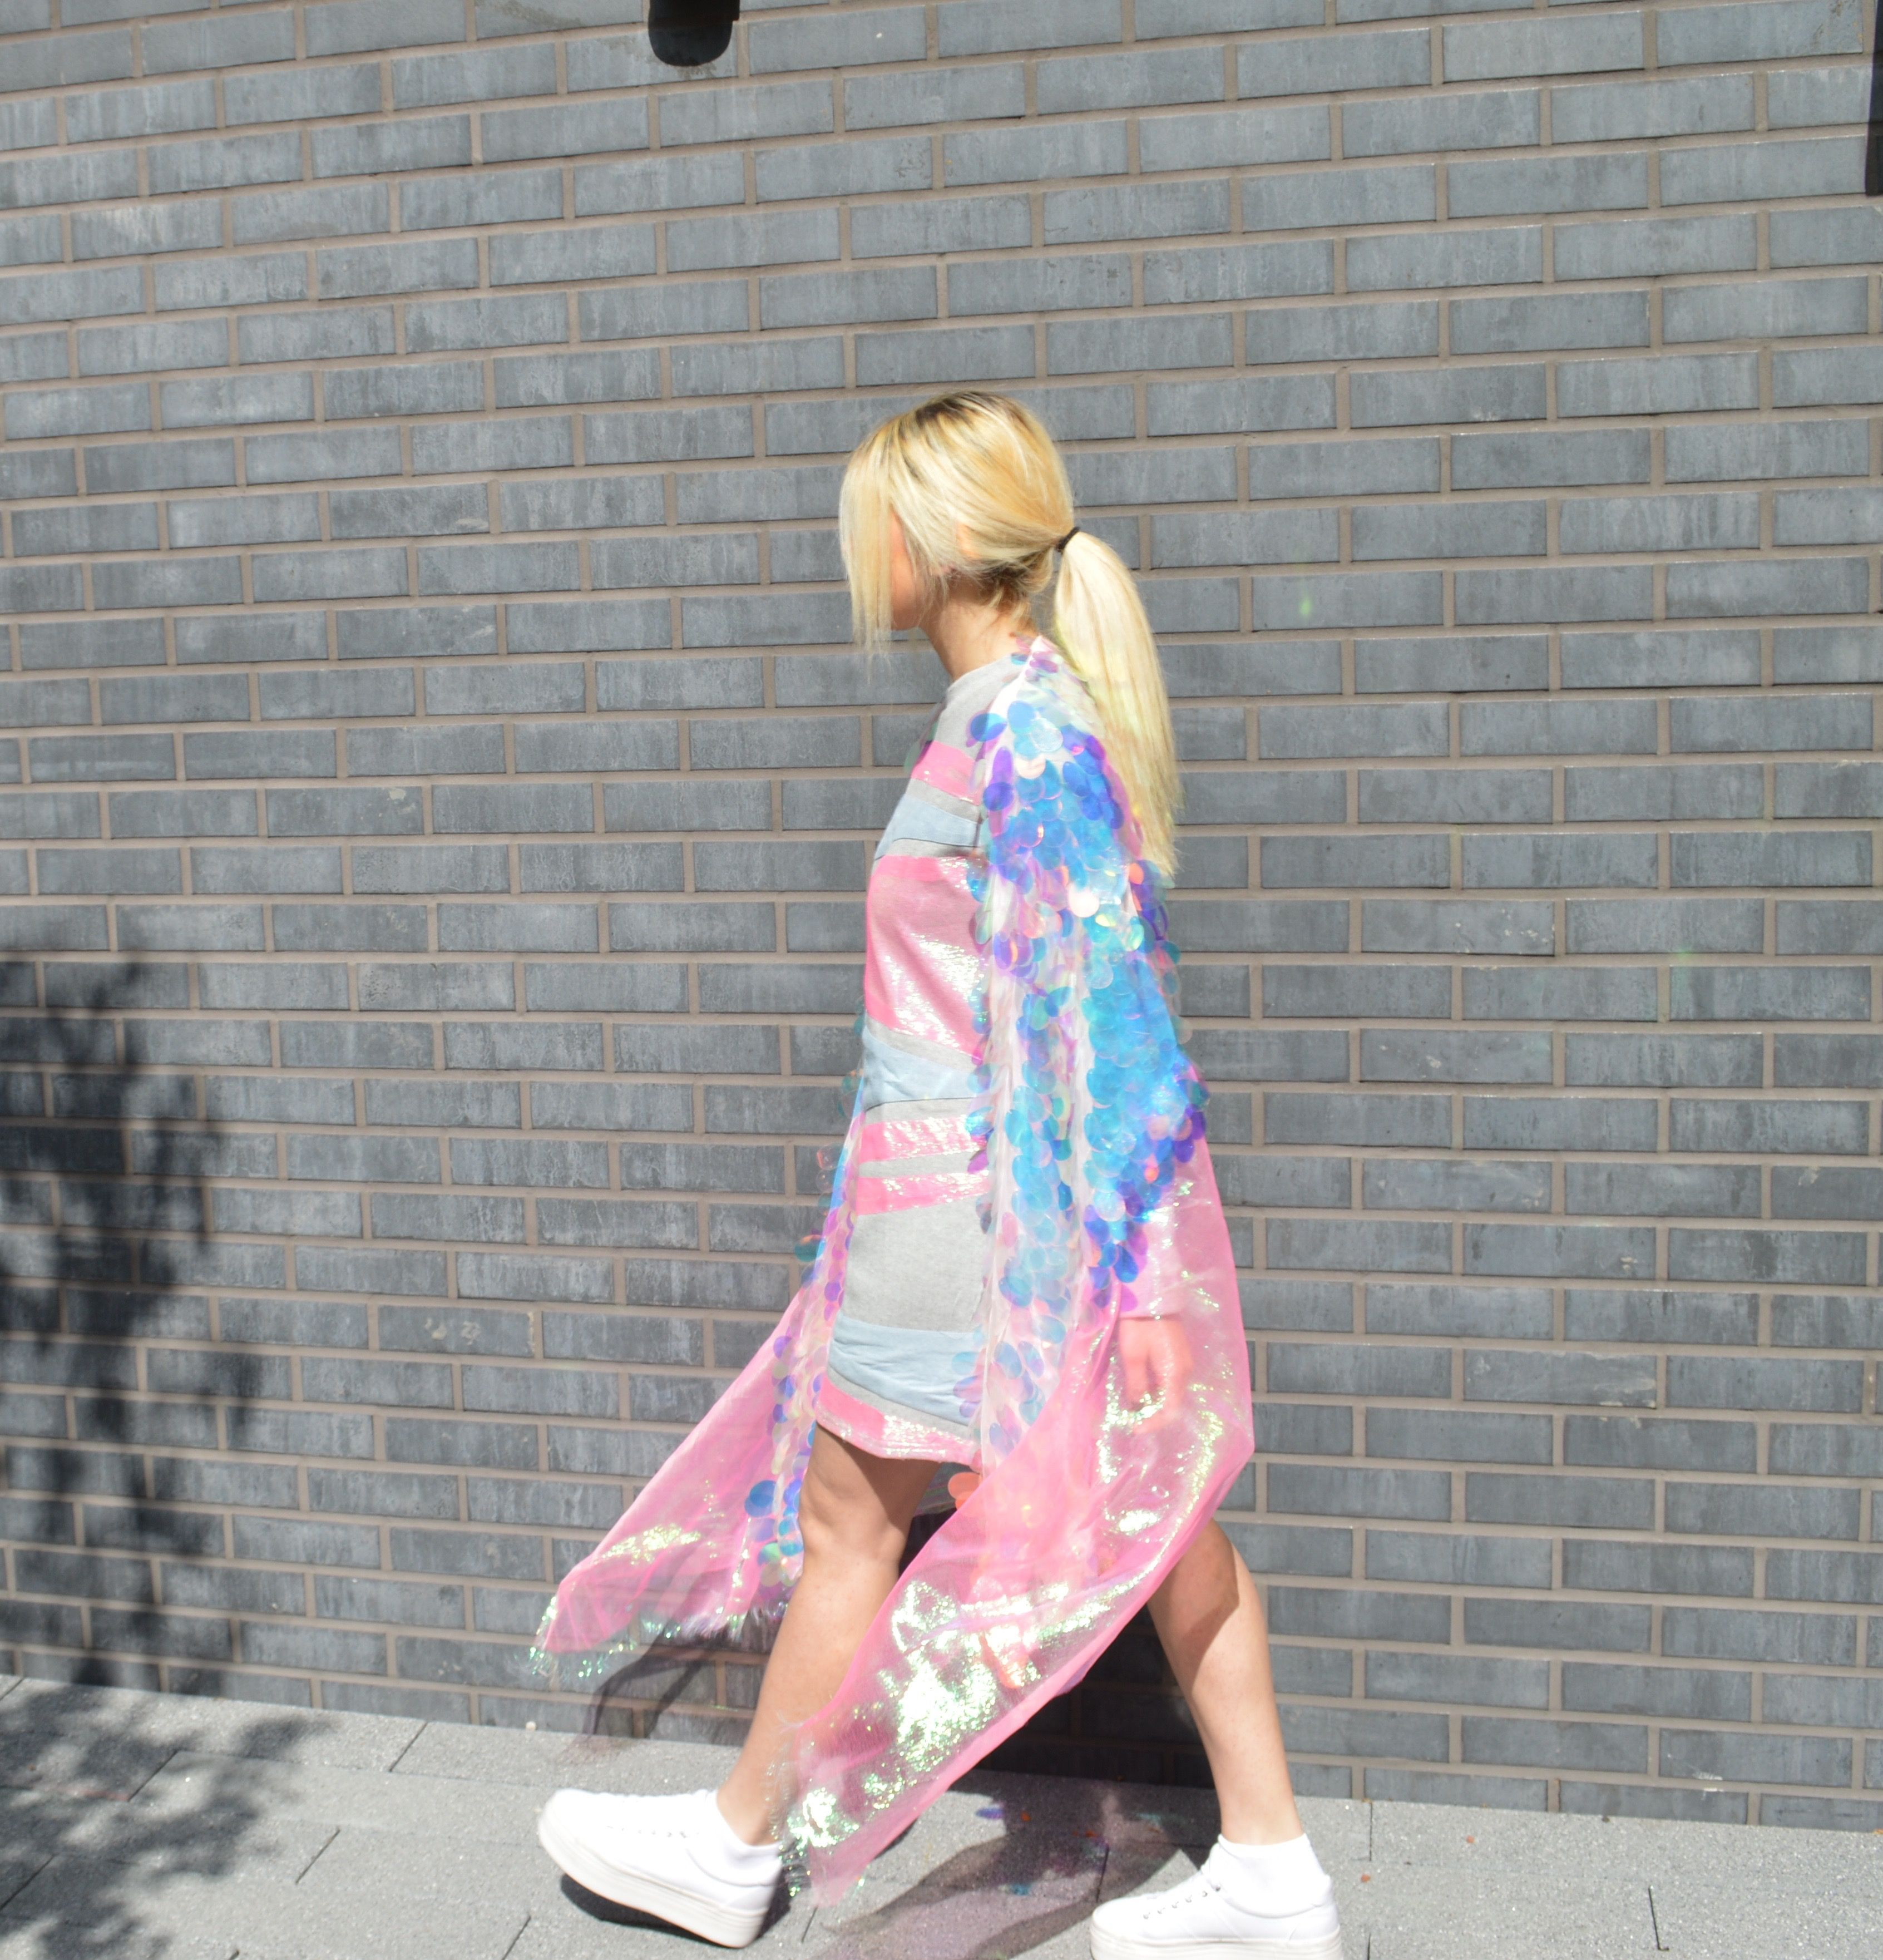 @camillasantin, camilla santin design, fashion design, Uel, sequins, holograms